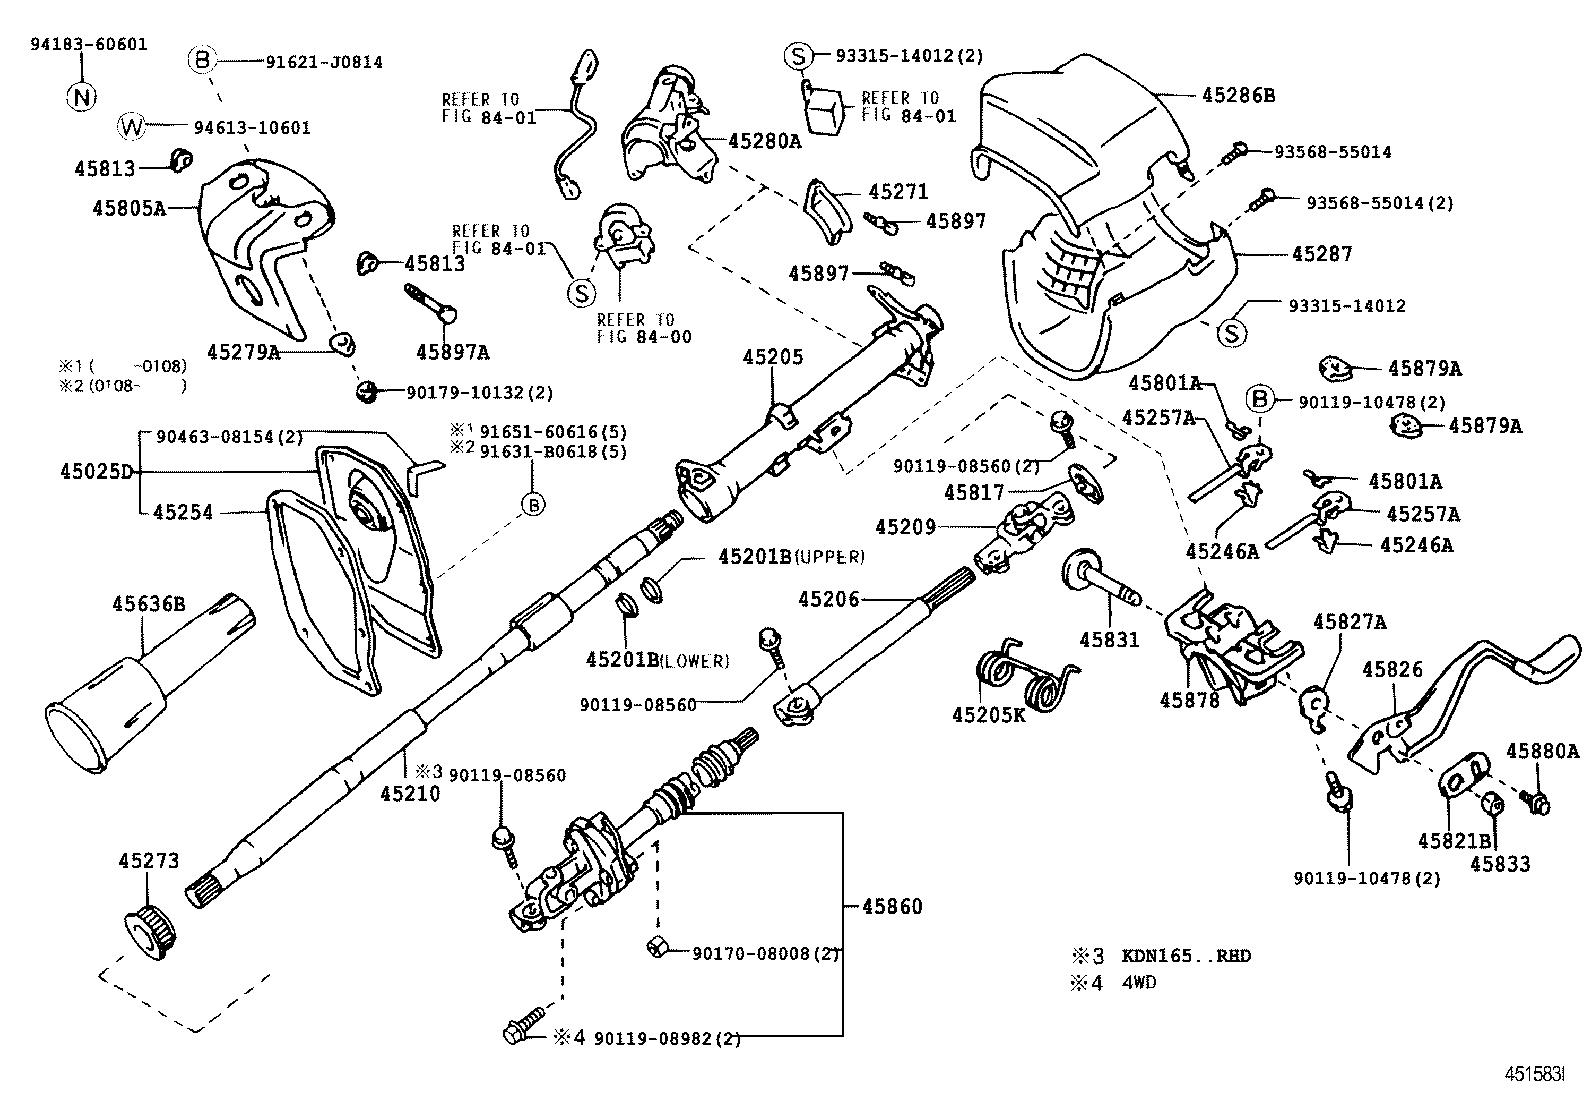 A Diagram Of Toyota Sequoia Abs